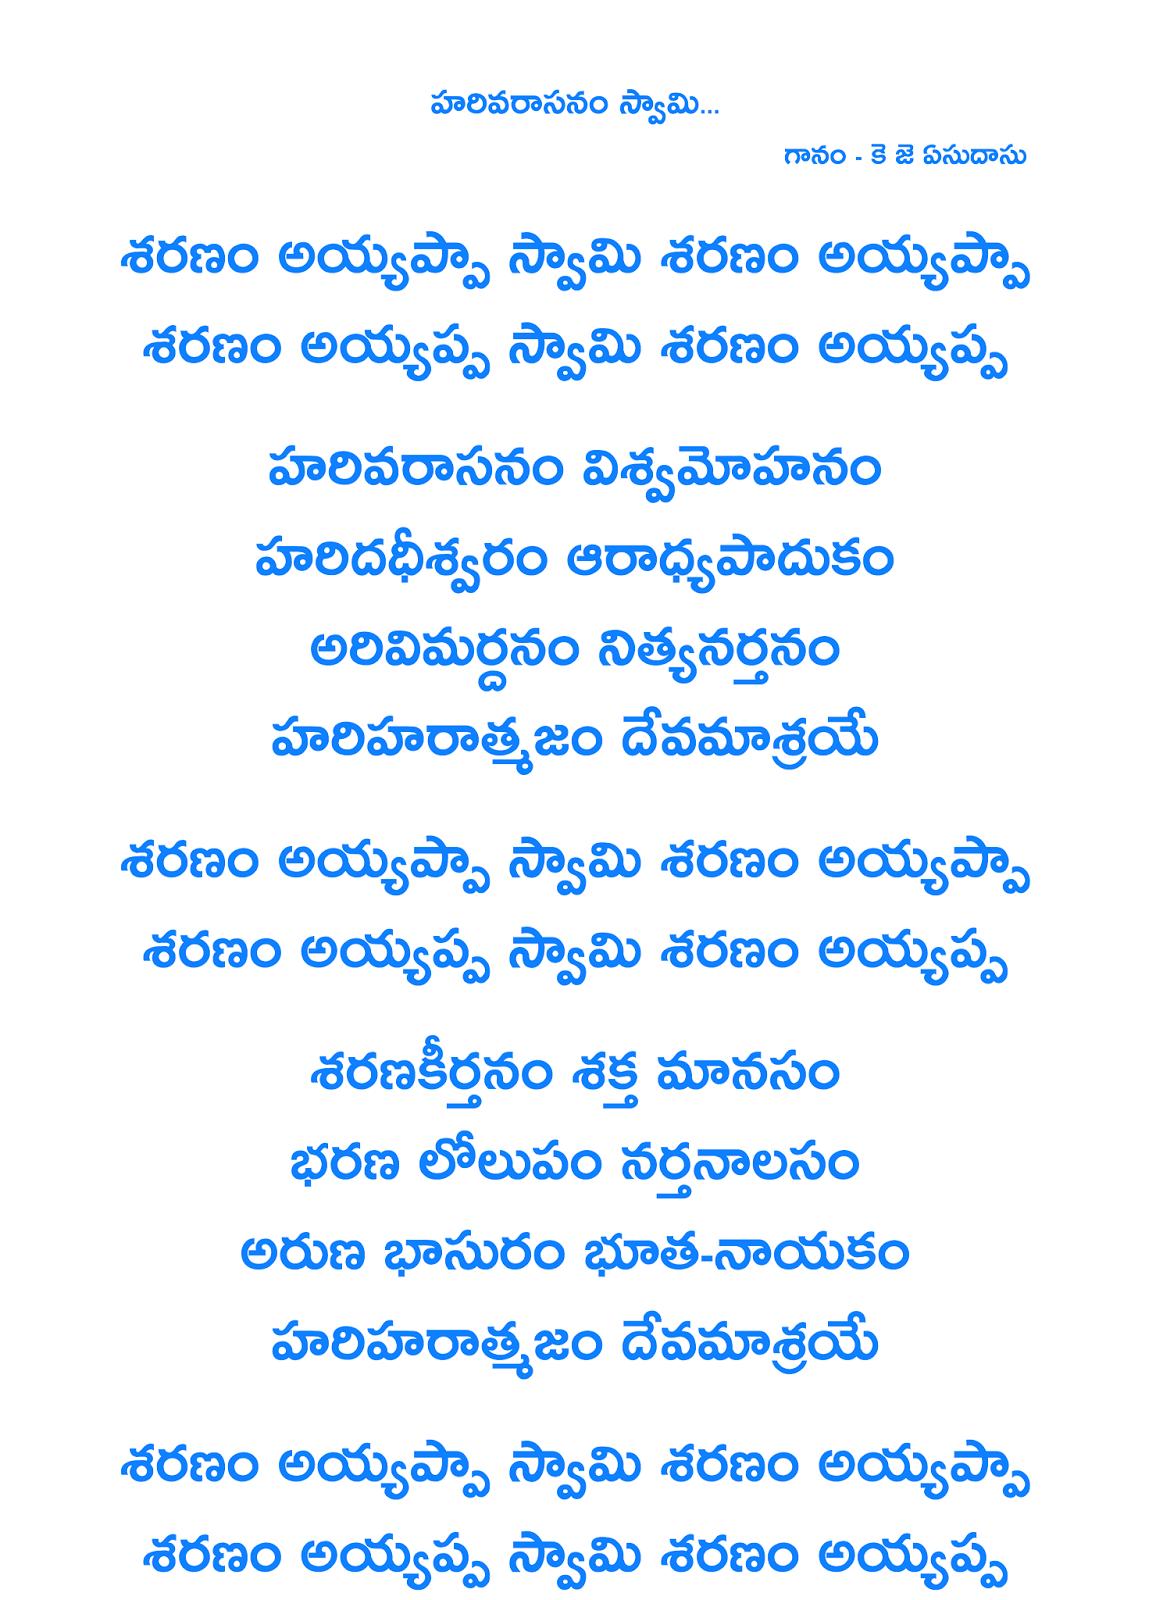 Harivarasanam, Karokke Video Mp3 3GP Mp4 HD Download